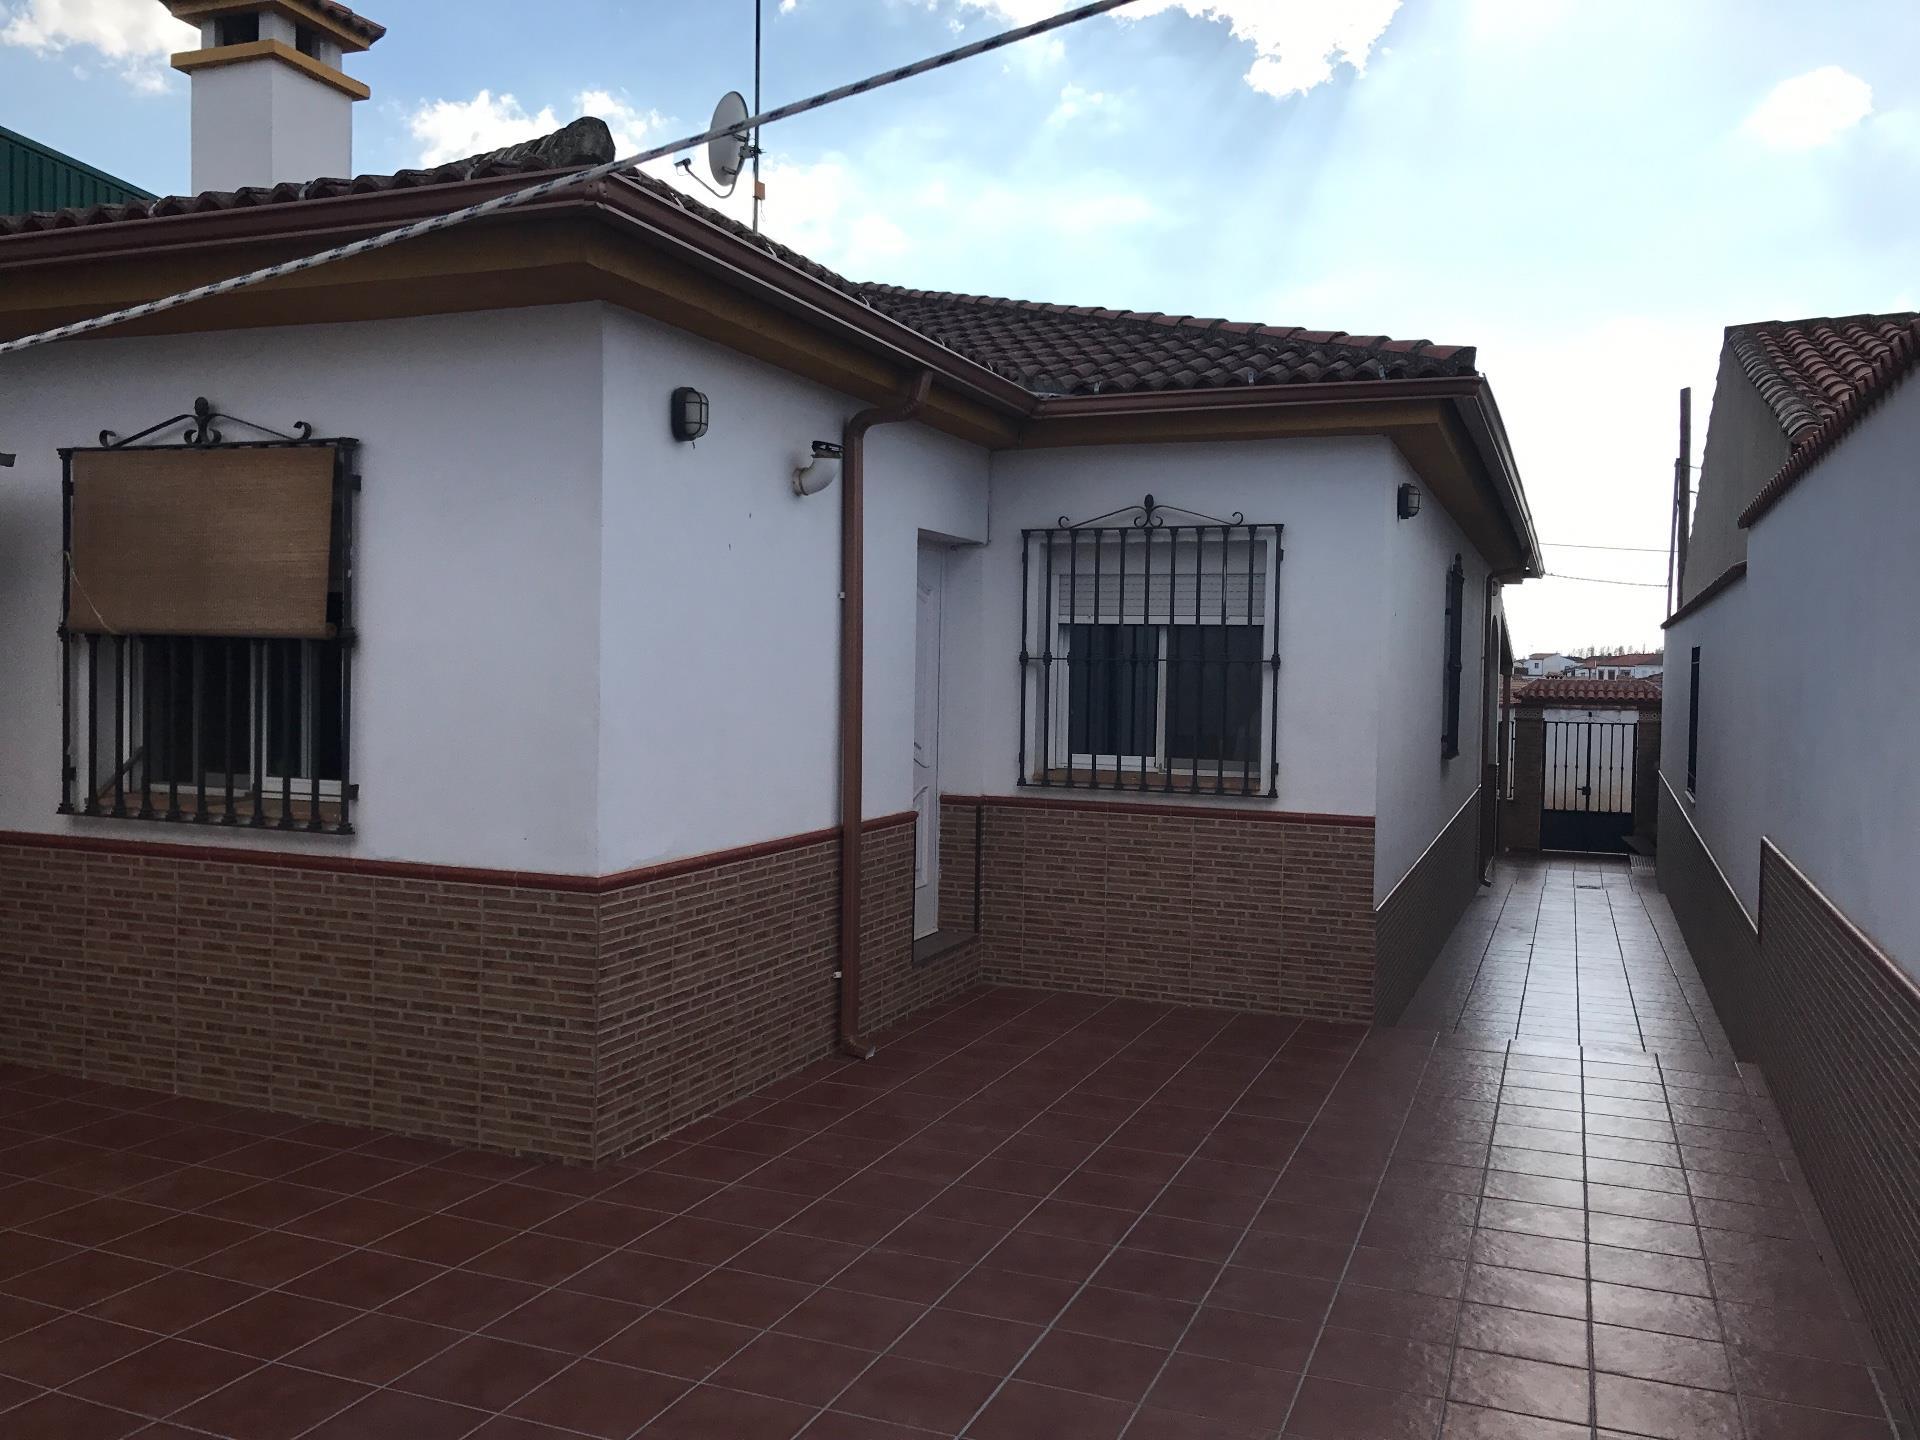 Casa  Calle rafael alberti. Santa elena